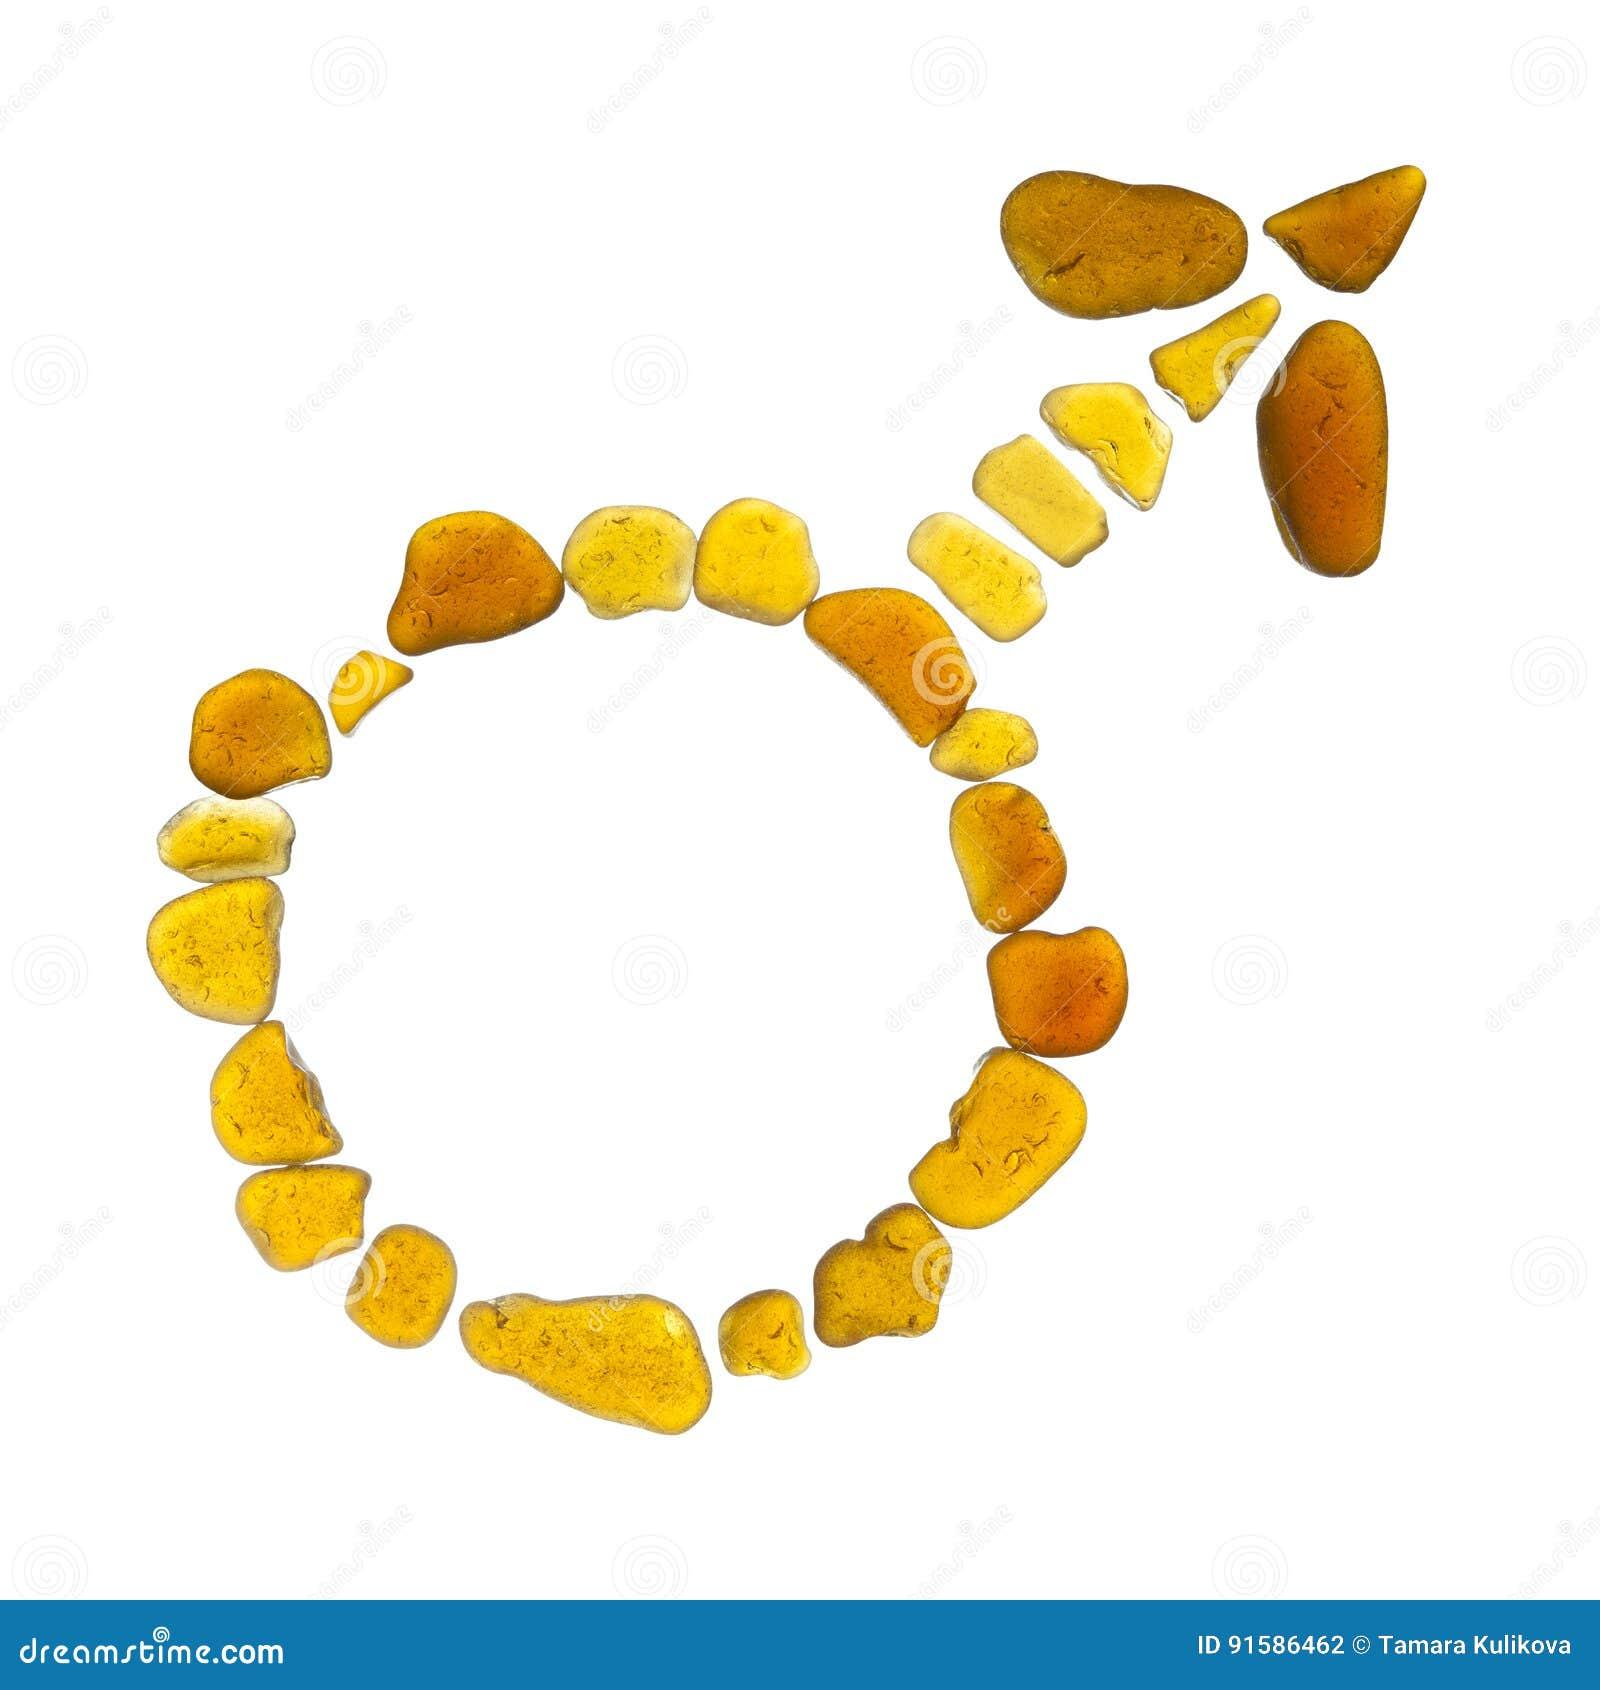 Sea glass mosaic jupiter astrological symbol stock photo image royalty free stock photo biocorpaavc Choice Image